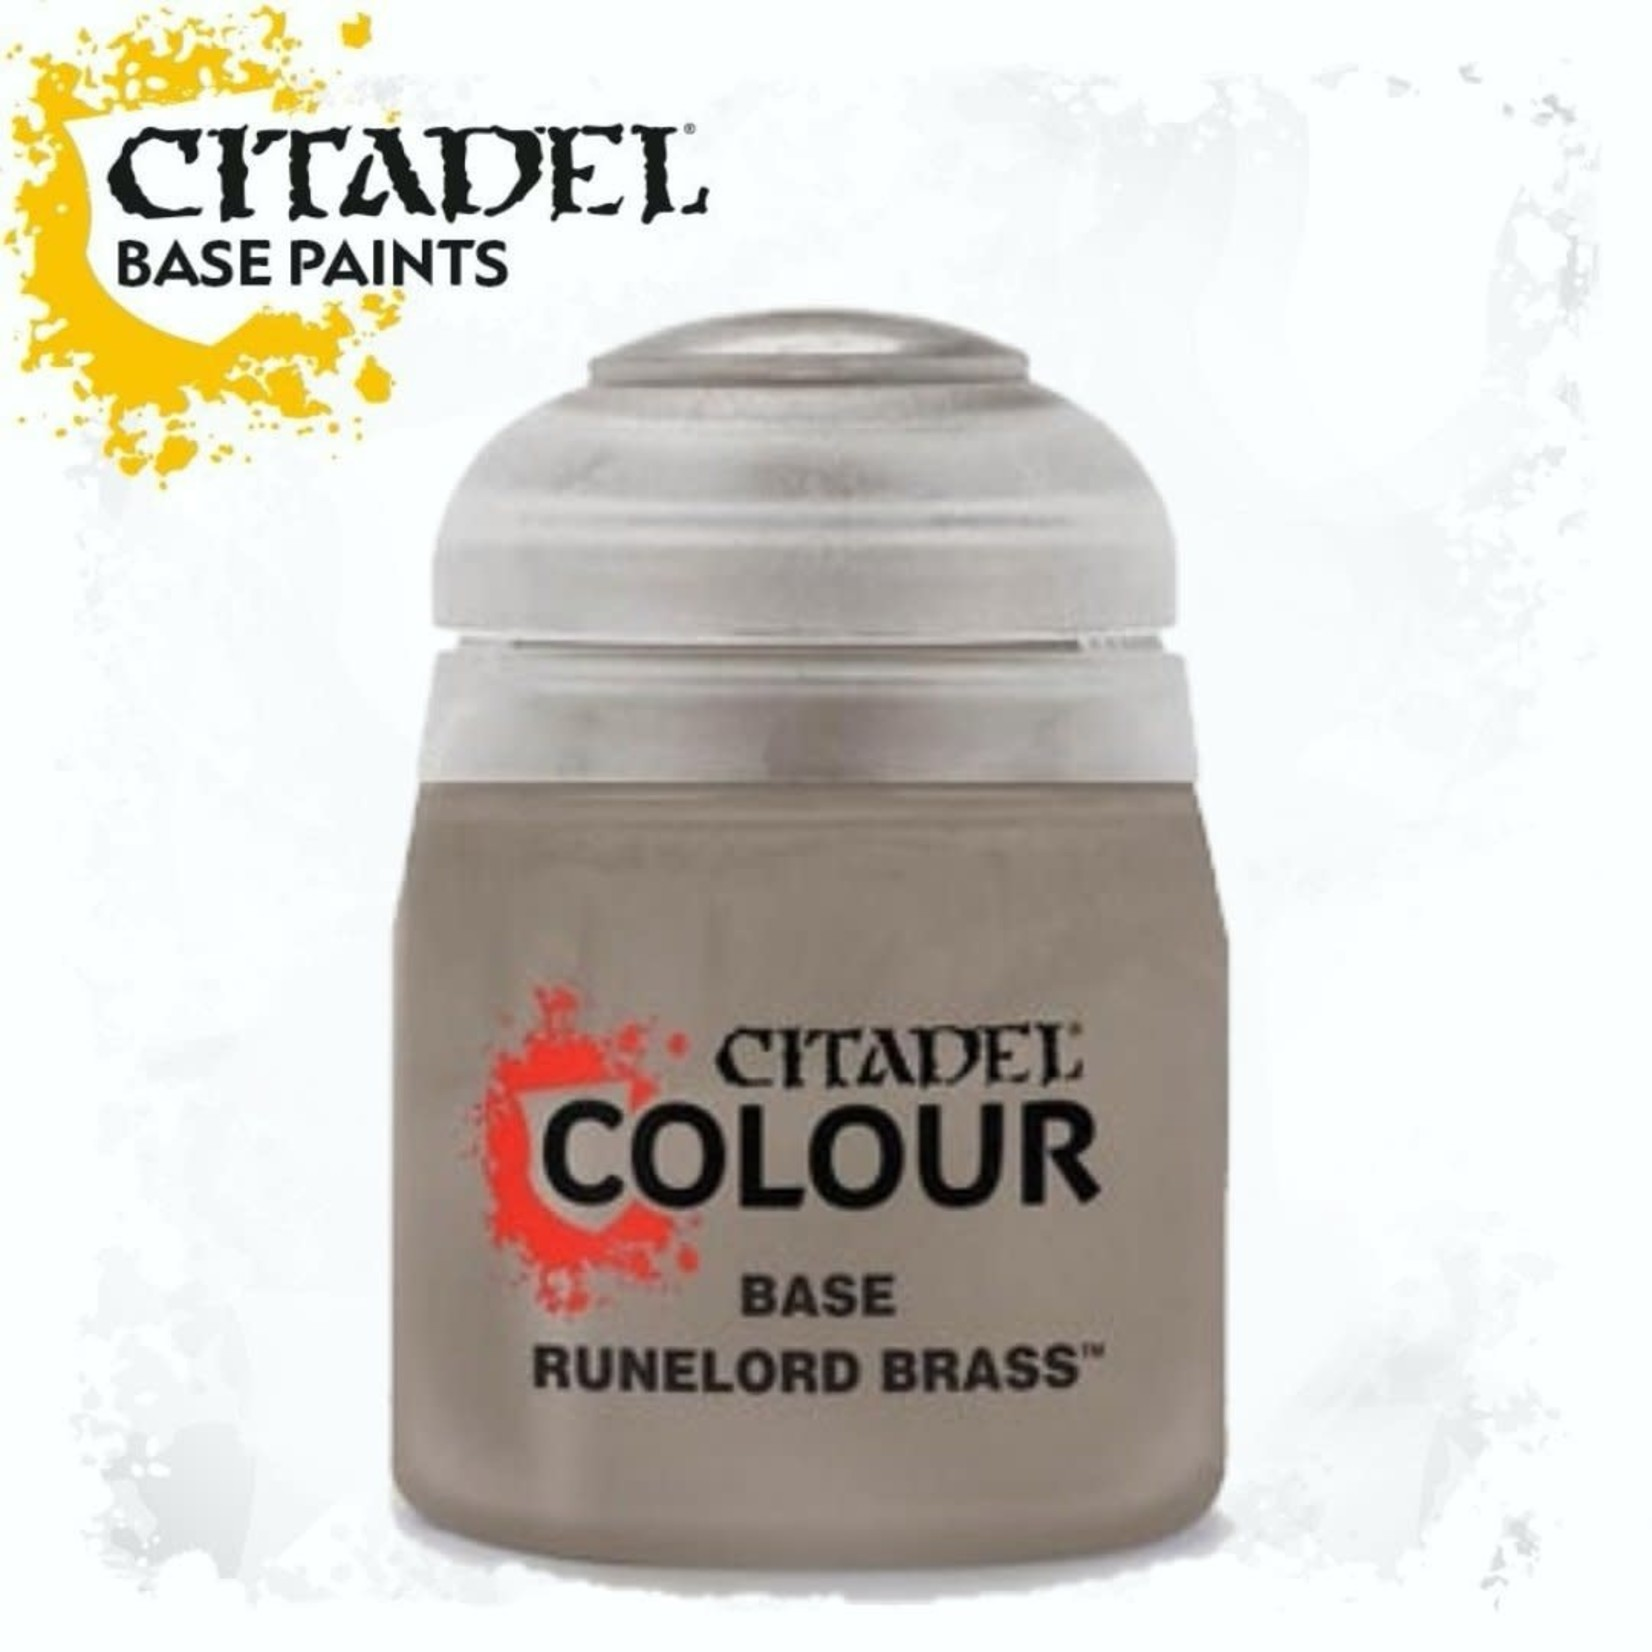 Citadel Citadel Paint - Base: Runelord Brass